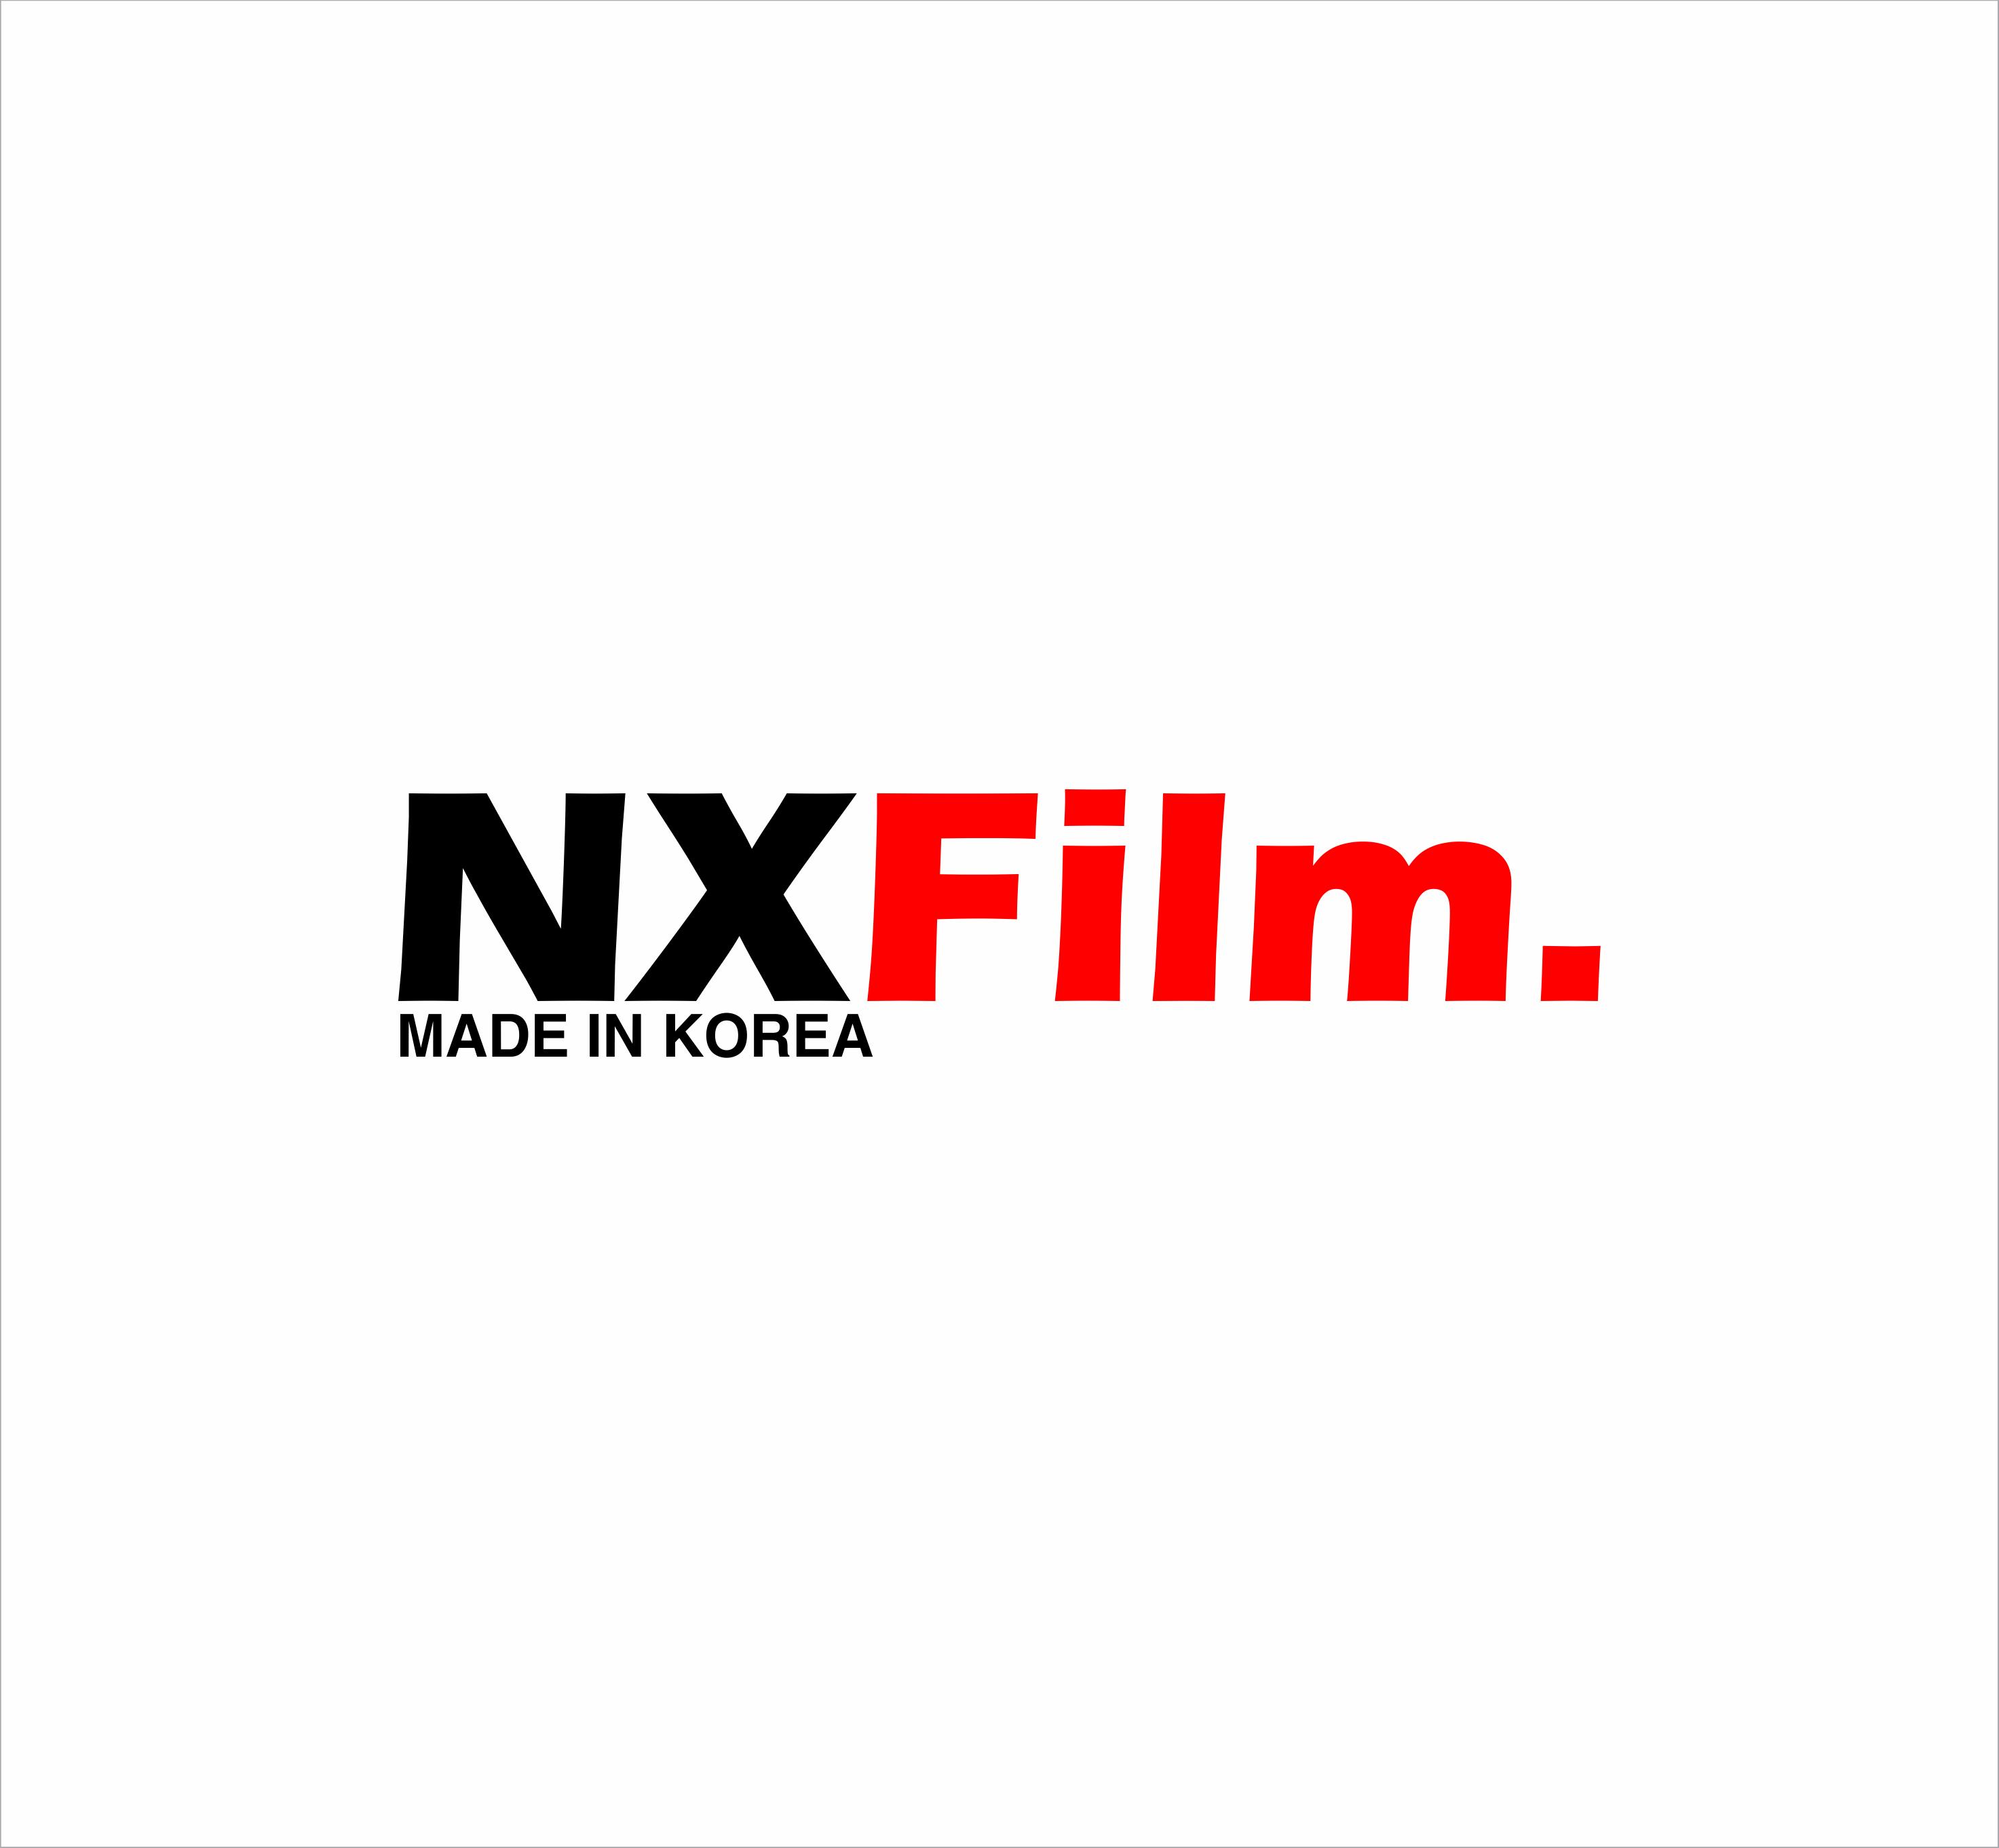 CLEAR 4 MIL NXFILM COREANA